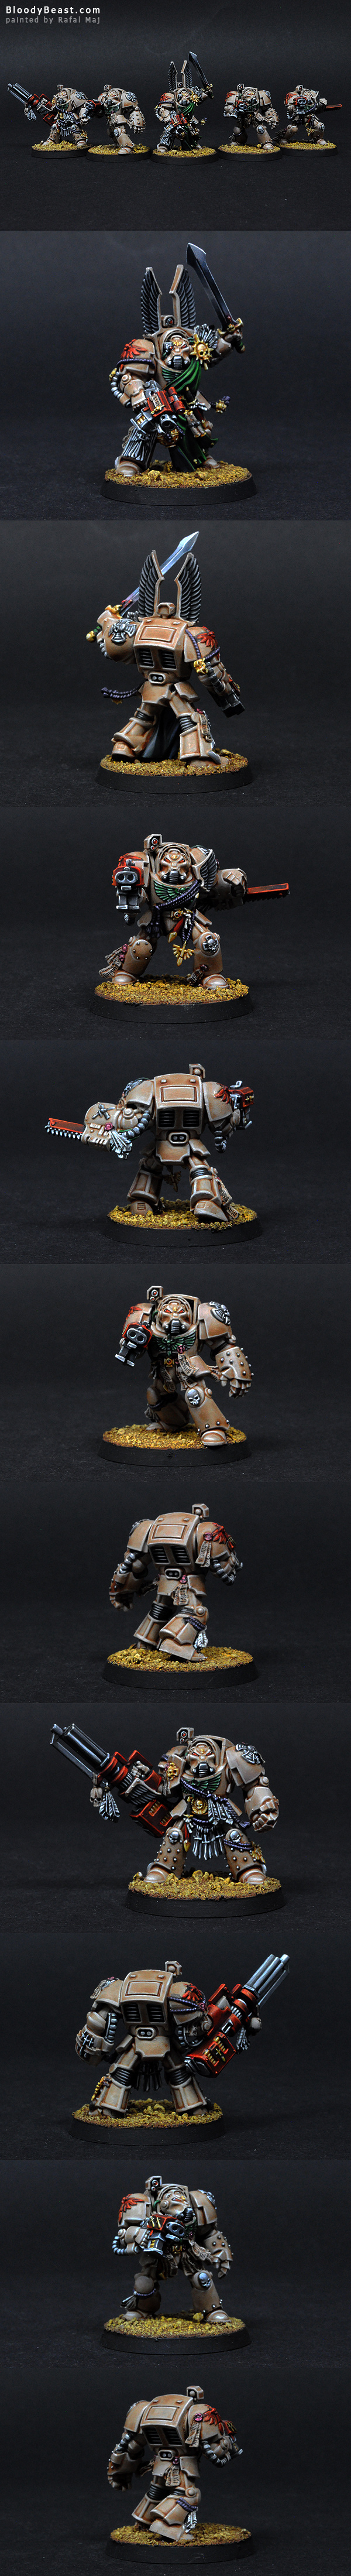 Dark Angels Deathwing Terminator Squad painted by Rafal Maj (BloodyBeast.com)